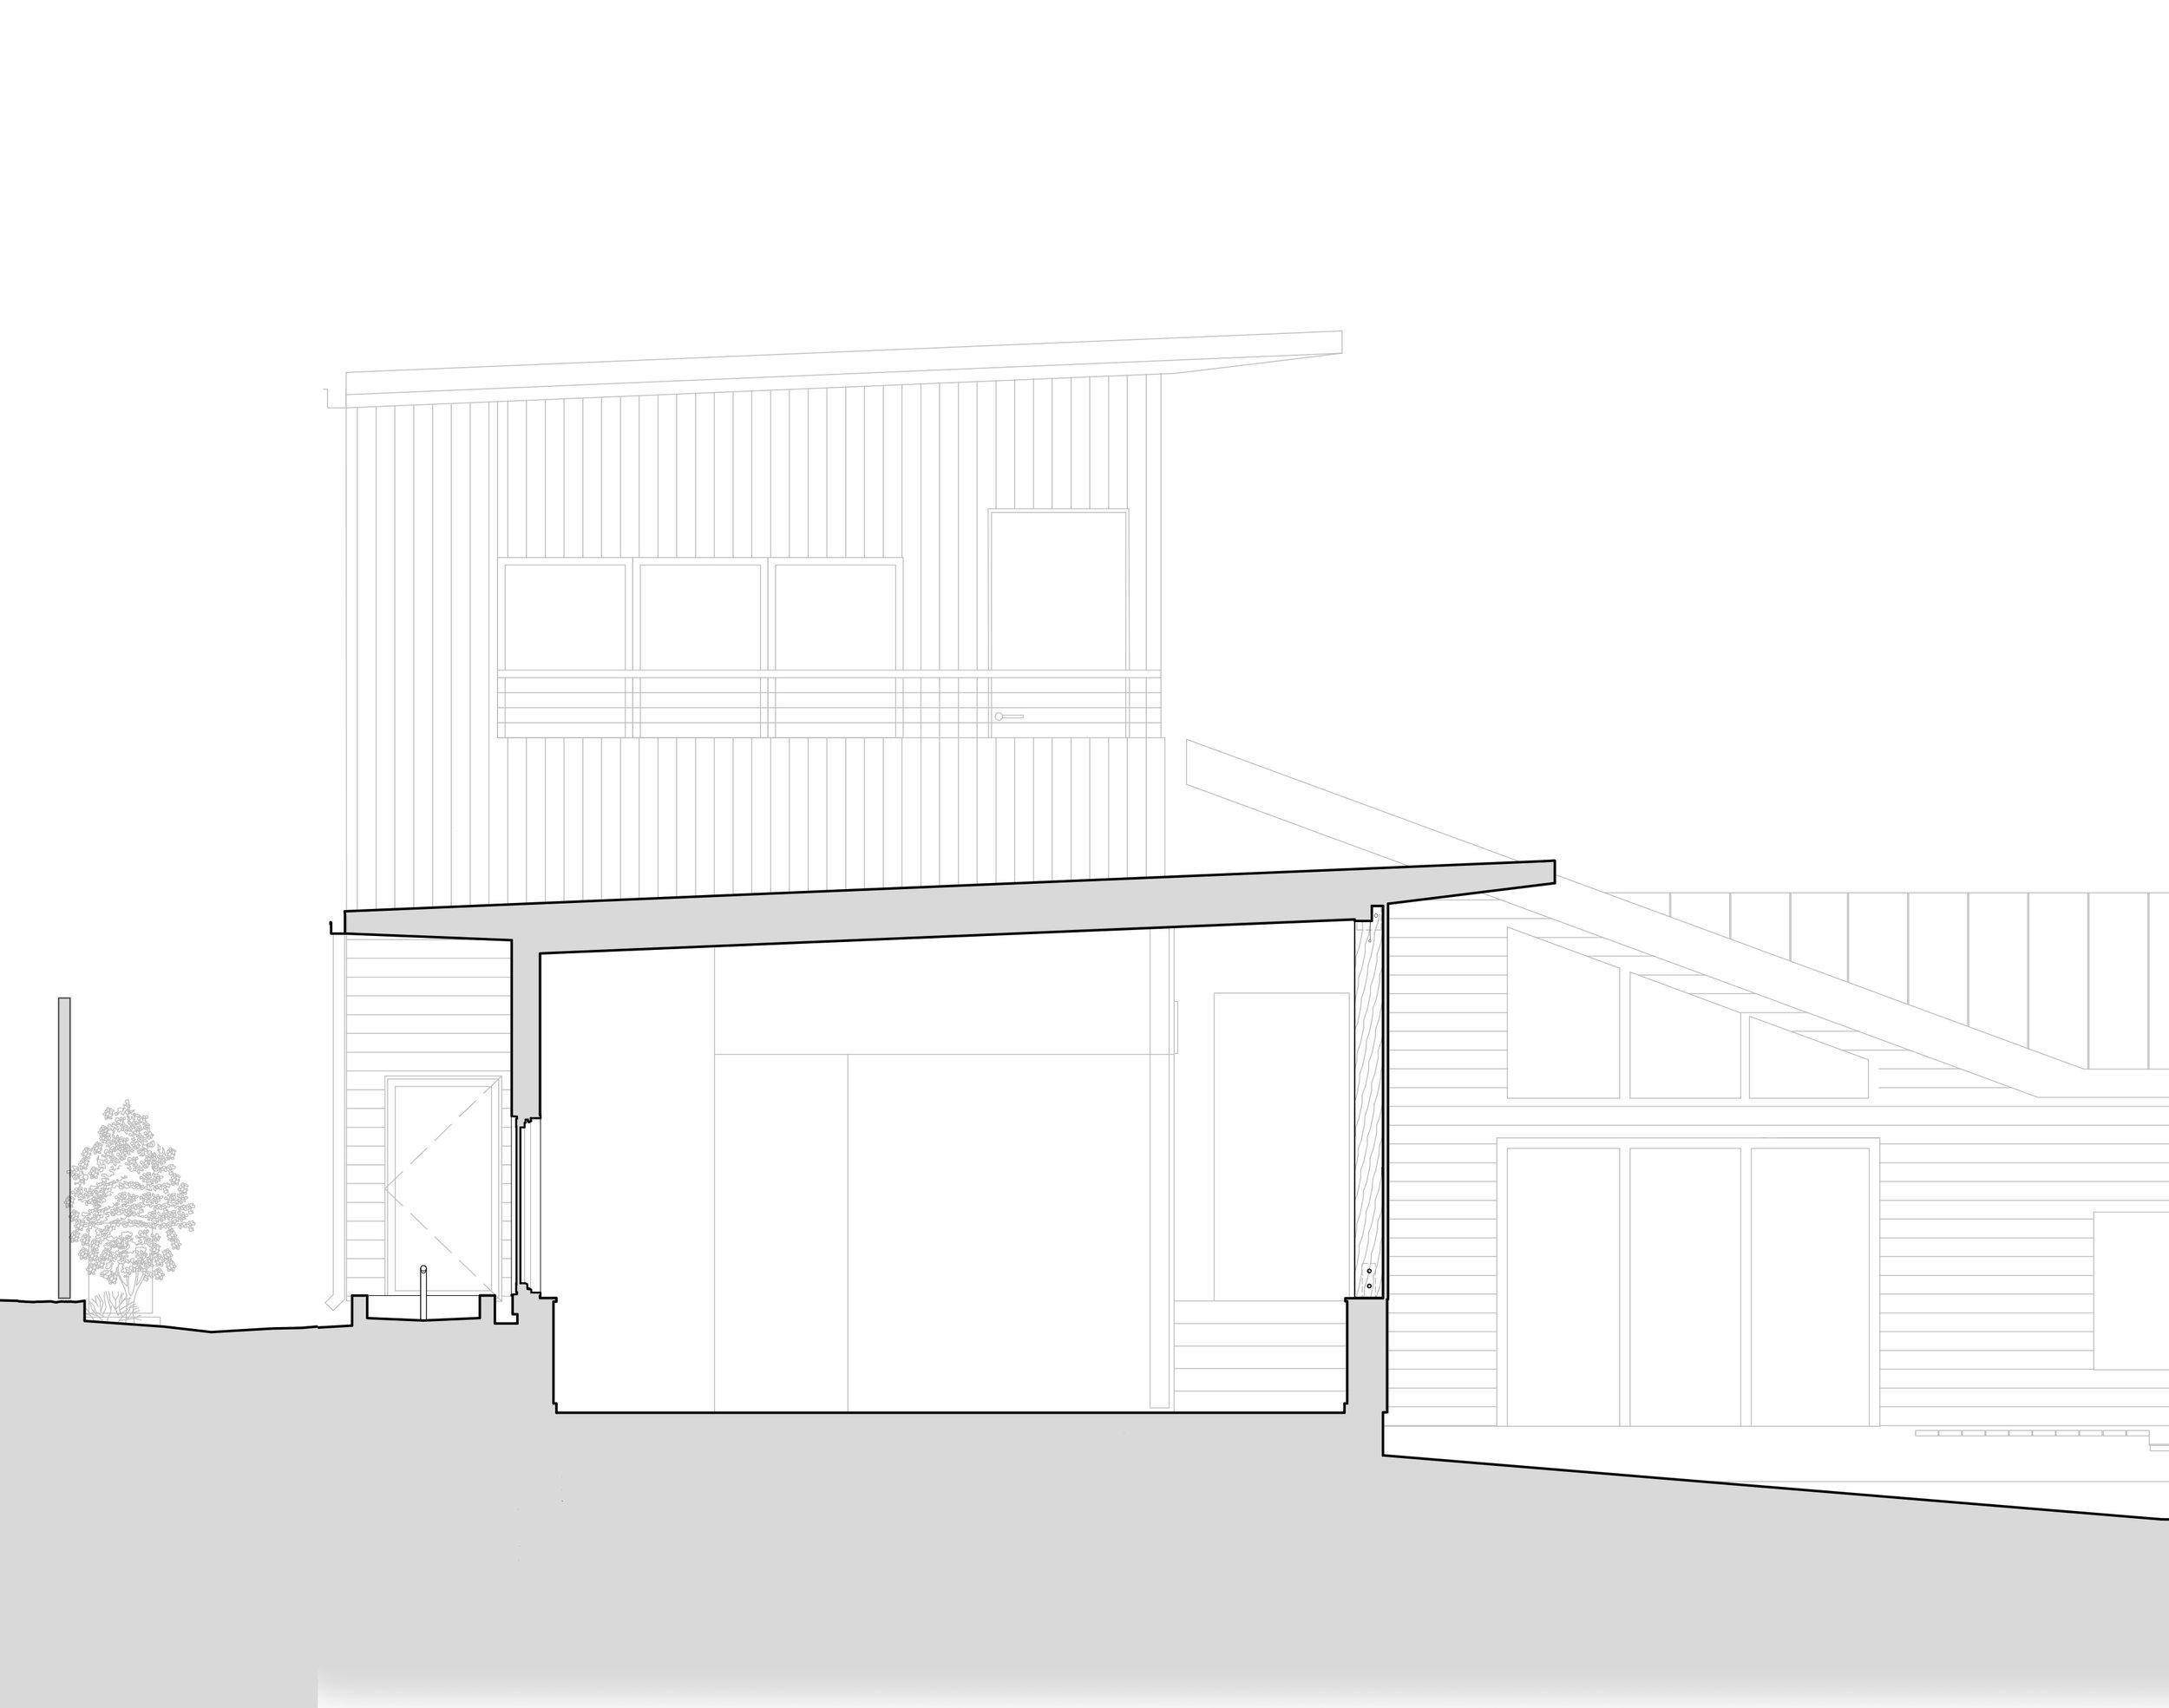 05 Barton Hills Addition_section 1.jpg